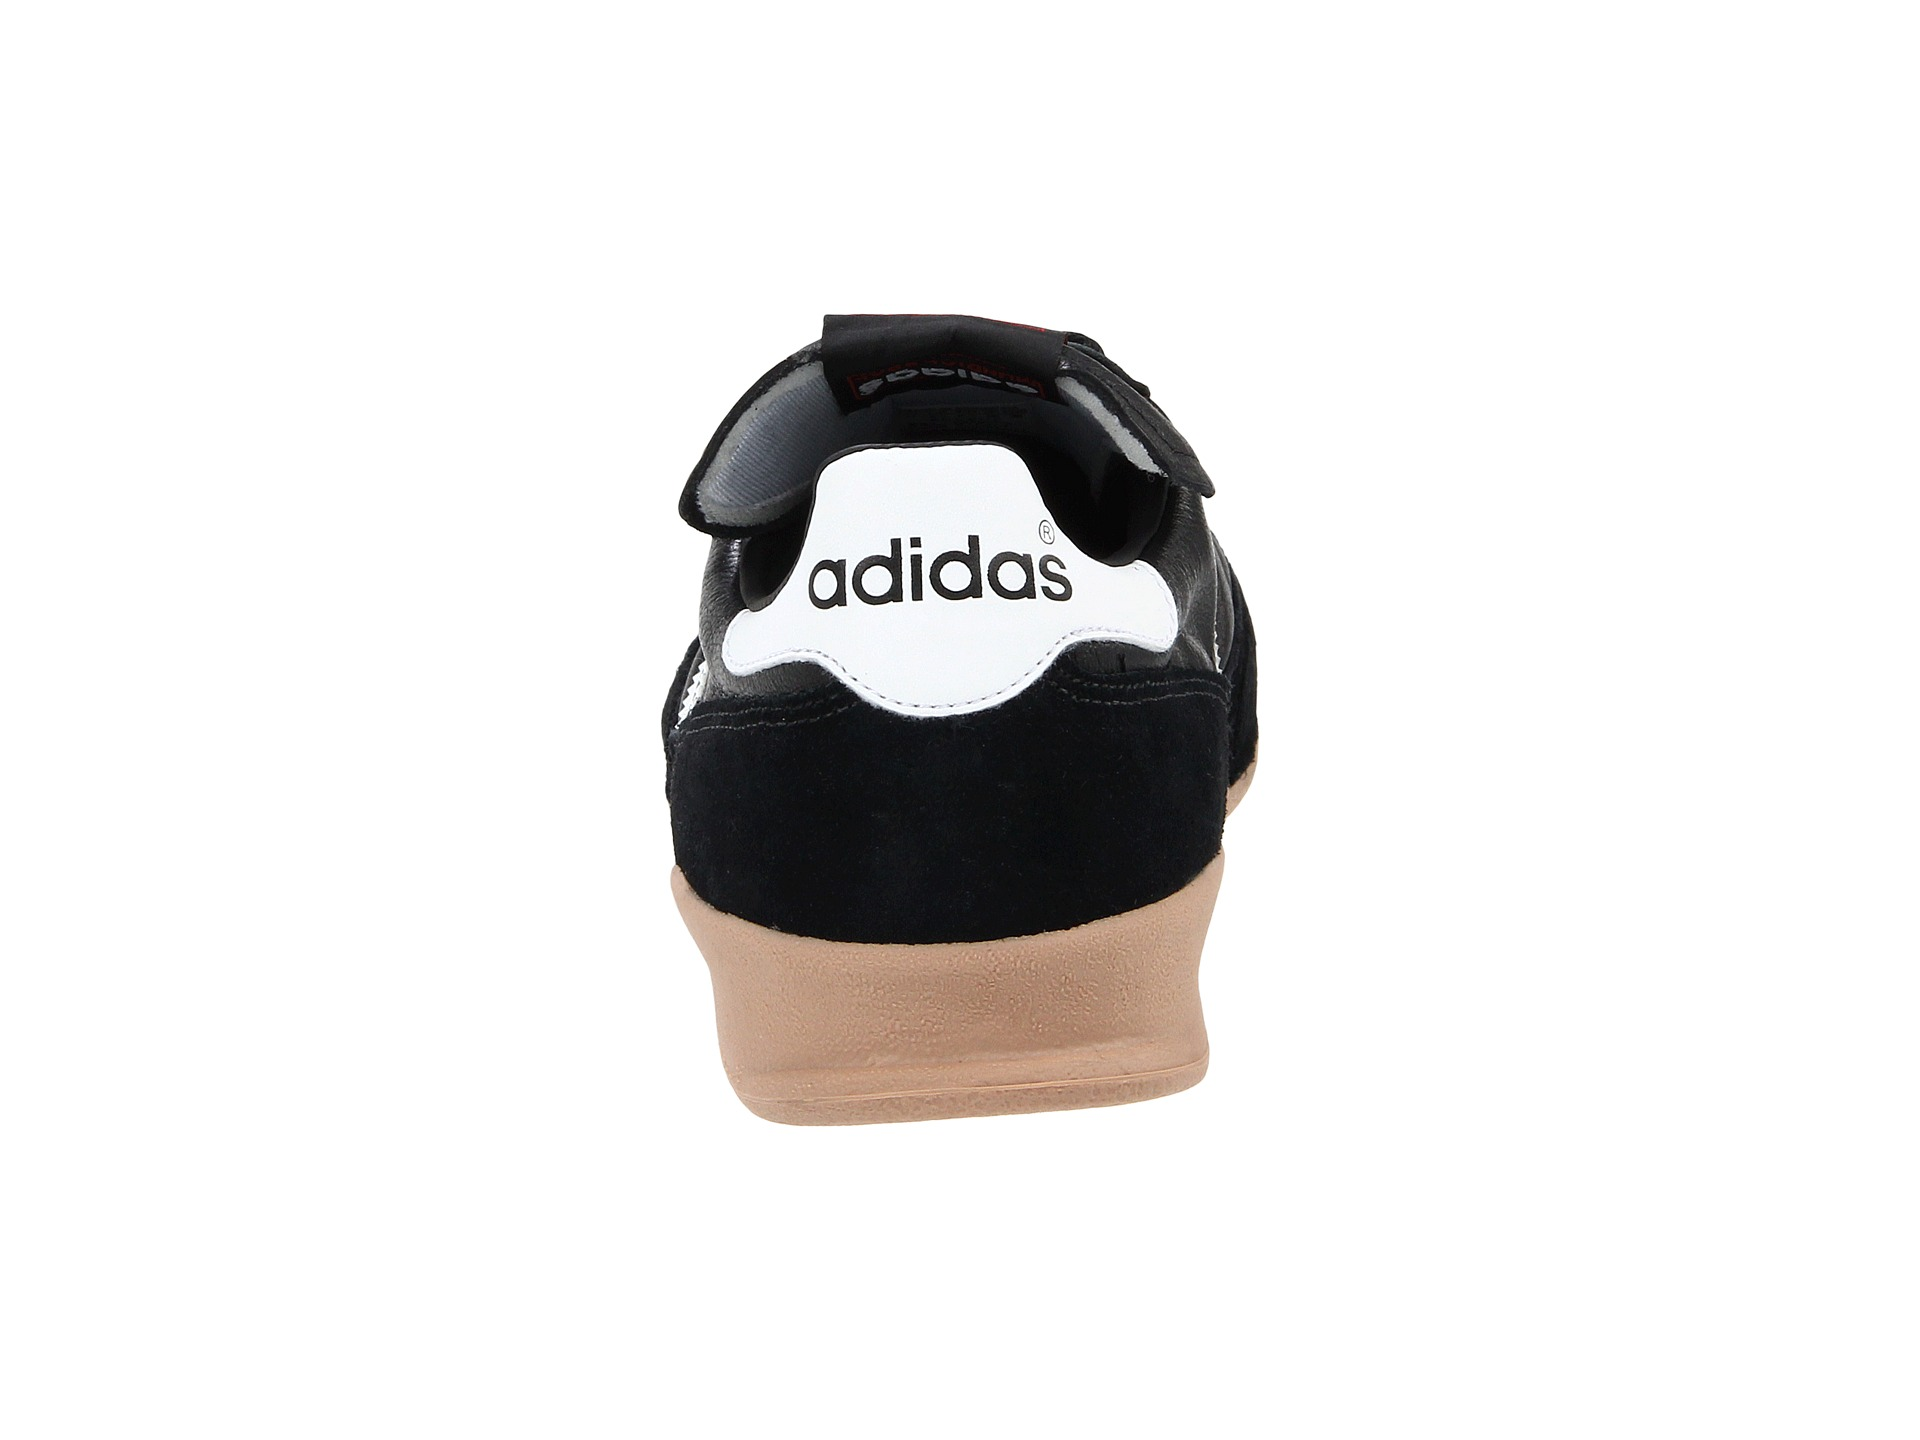 7f7bed37c0 Adidas Mundial Goal On Sale Adidas Samba Classic